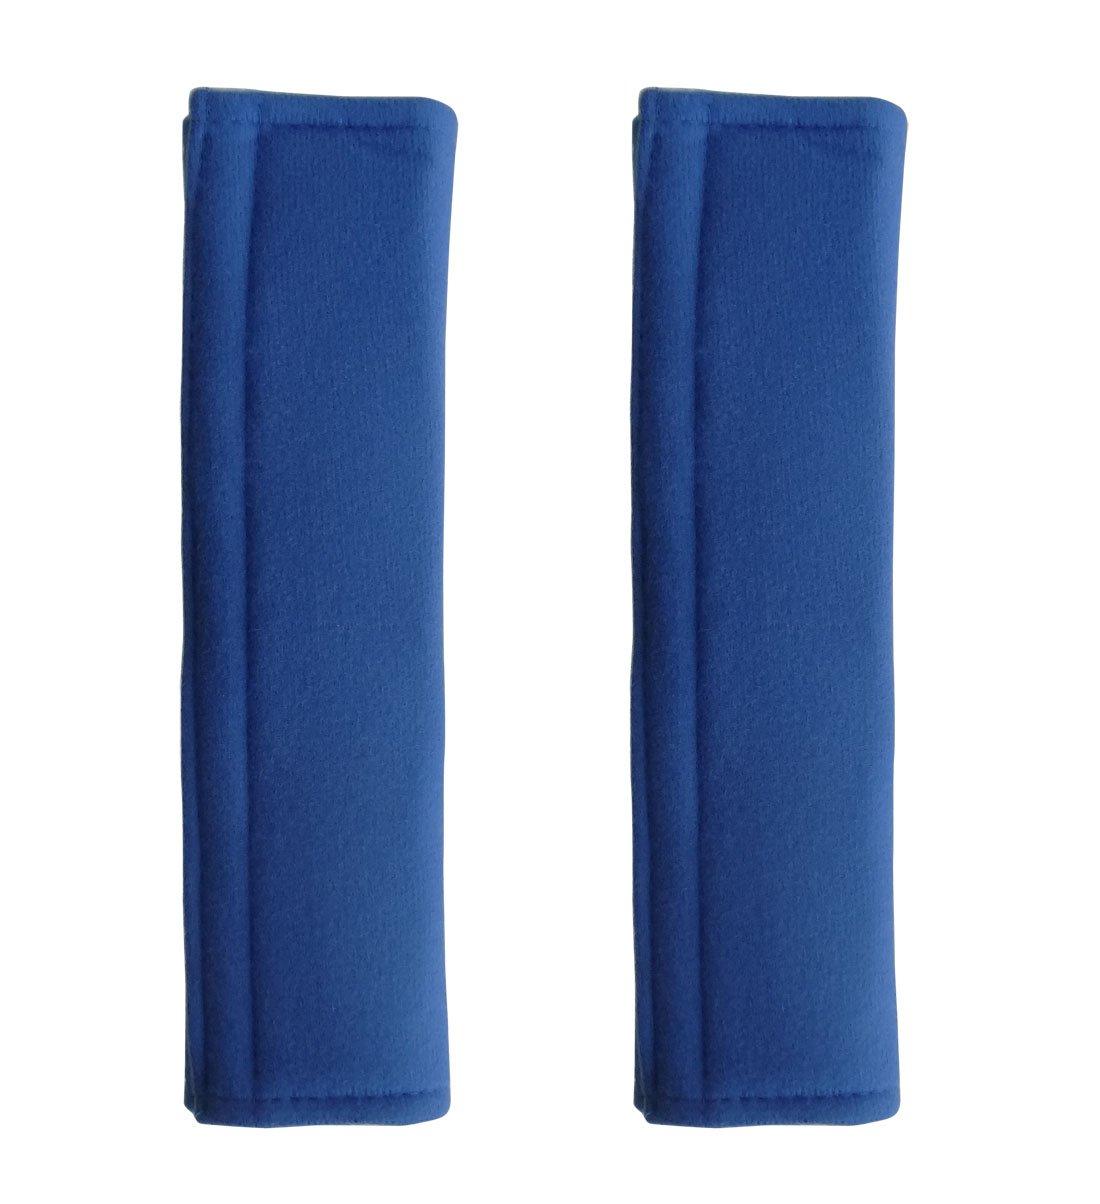 Penta Angel 柔らかい快適な厚い自動車シート安全ベルトカバー肩パッド 男性女性用  Blue, 2PCS B01L1EEJPK